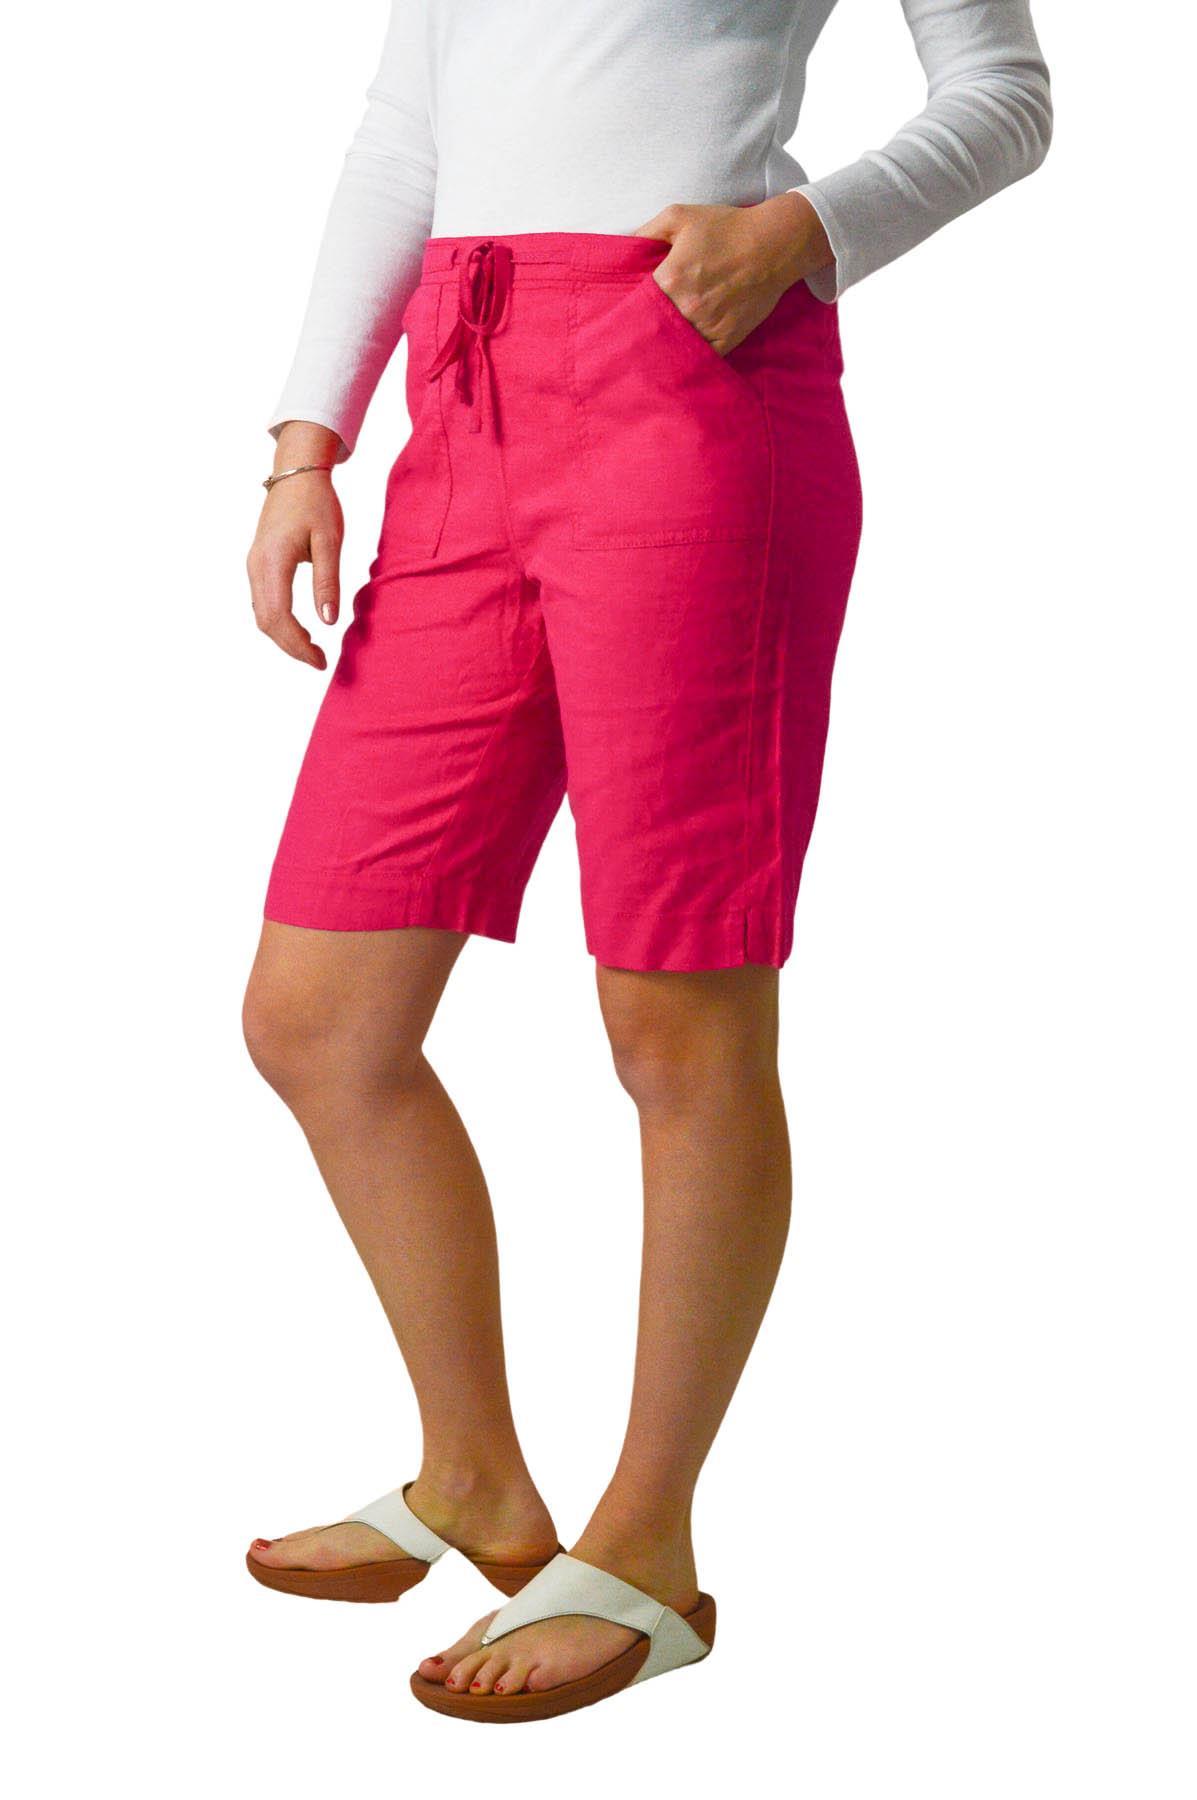 NEXT New Black Beige Pink LinenShorts Elasticated Waist Plus Size 10-24